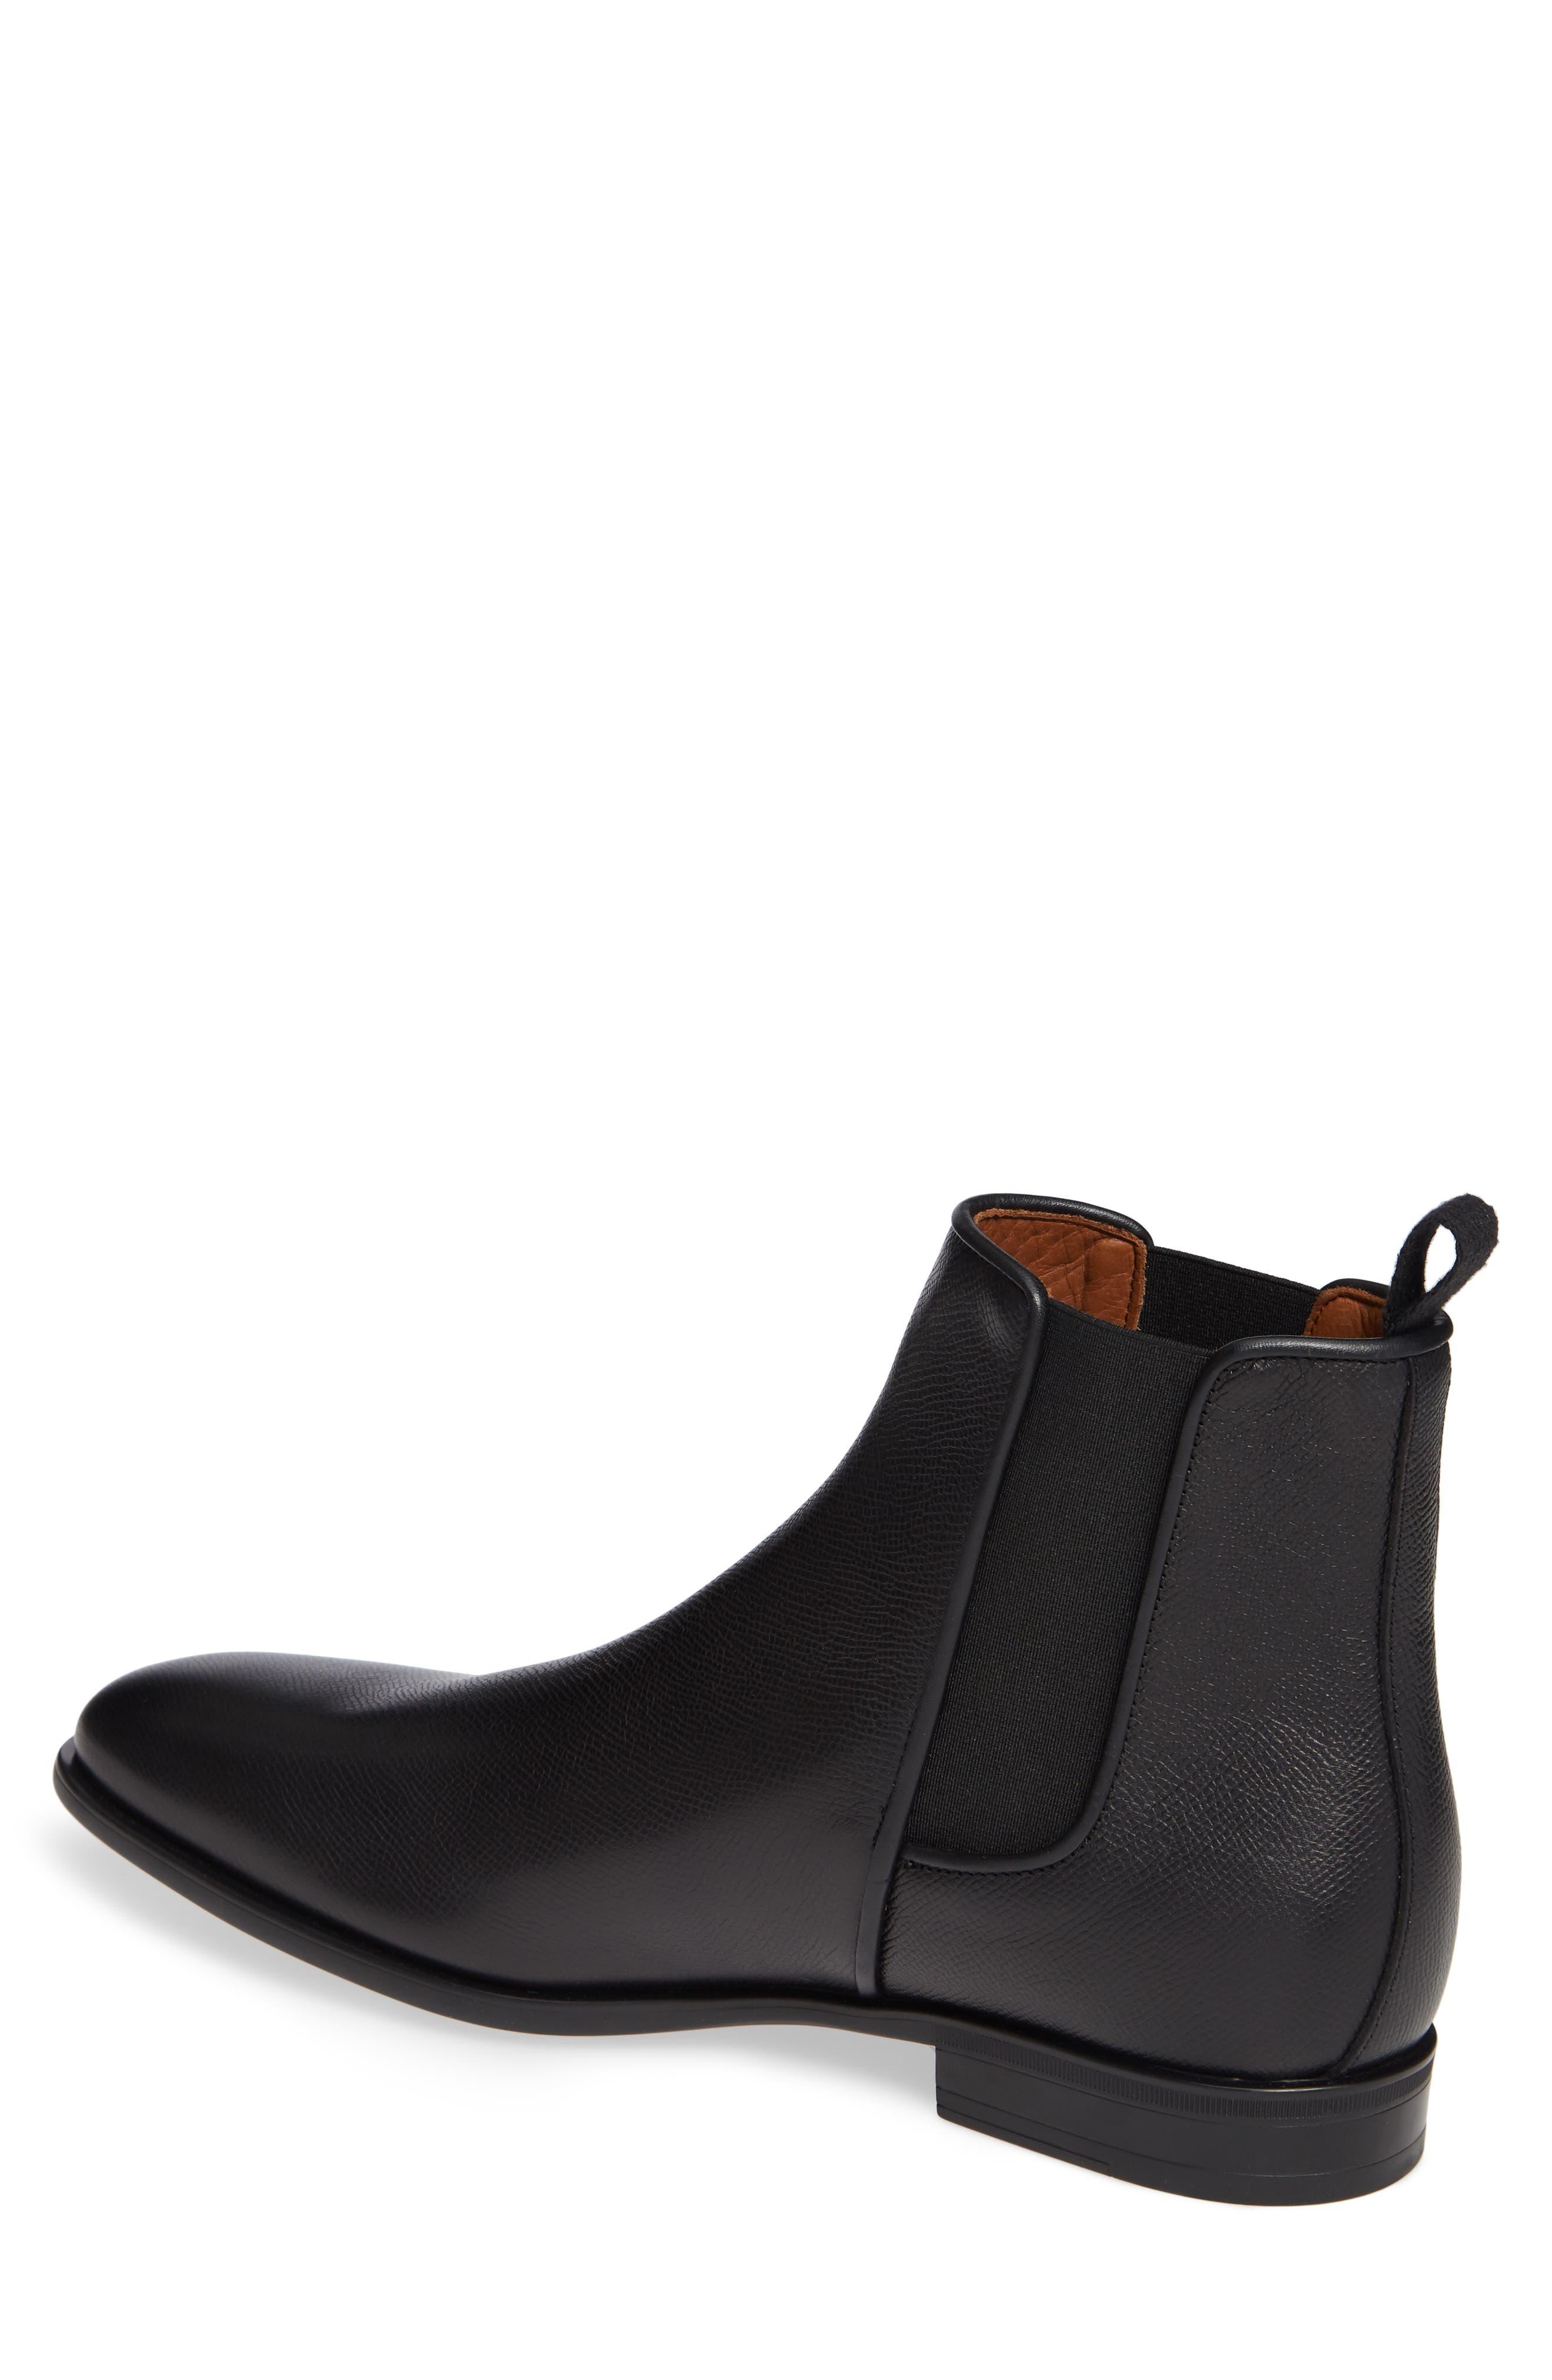 AQUATALIA, 'Adrian' Water Resistant Chelsea Boot, Alternate thumbnail 2, color, BLACK/ BLACK